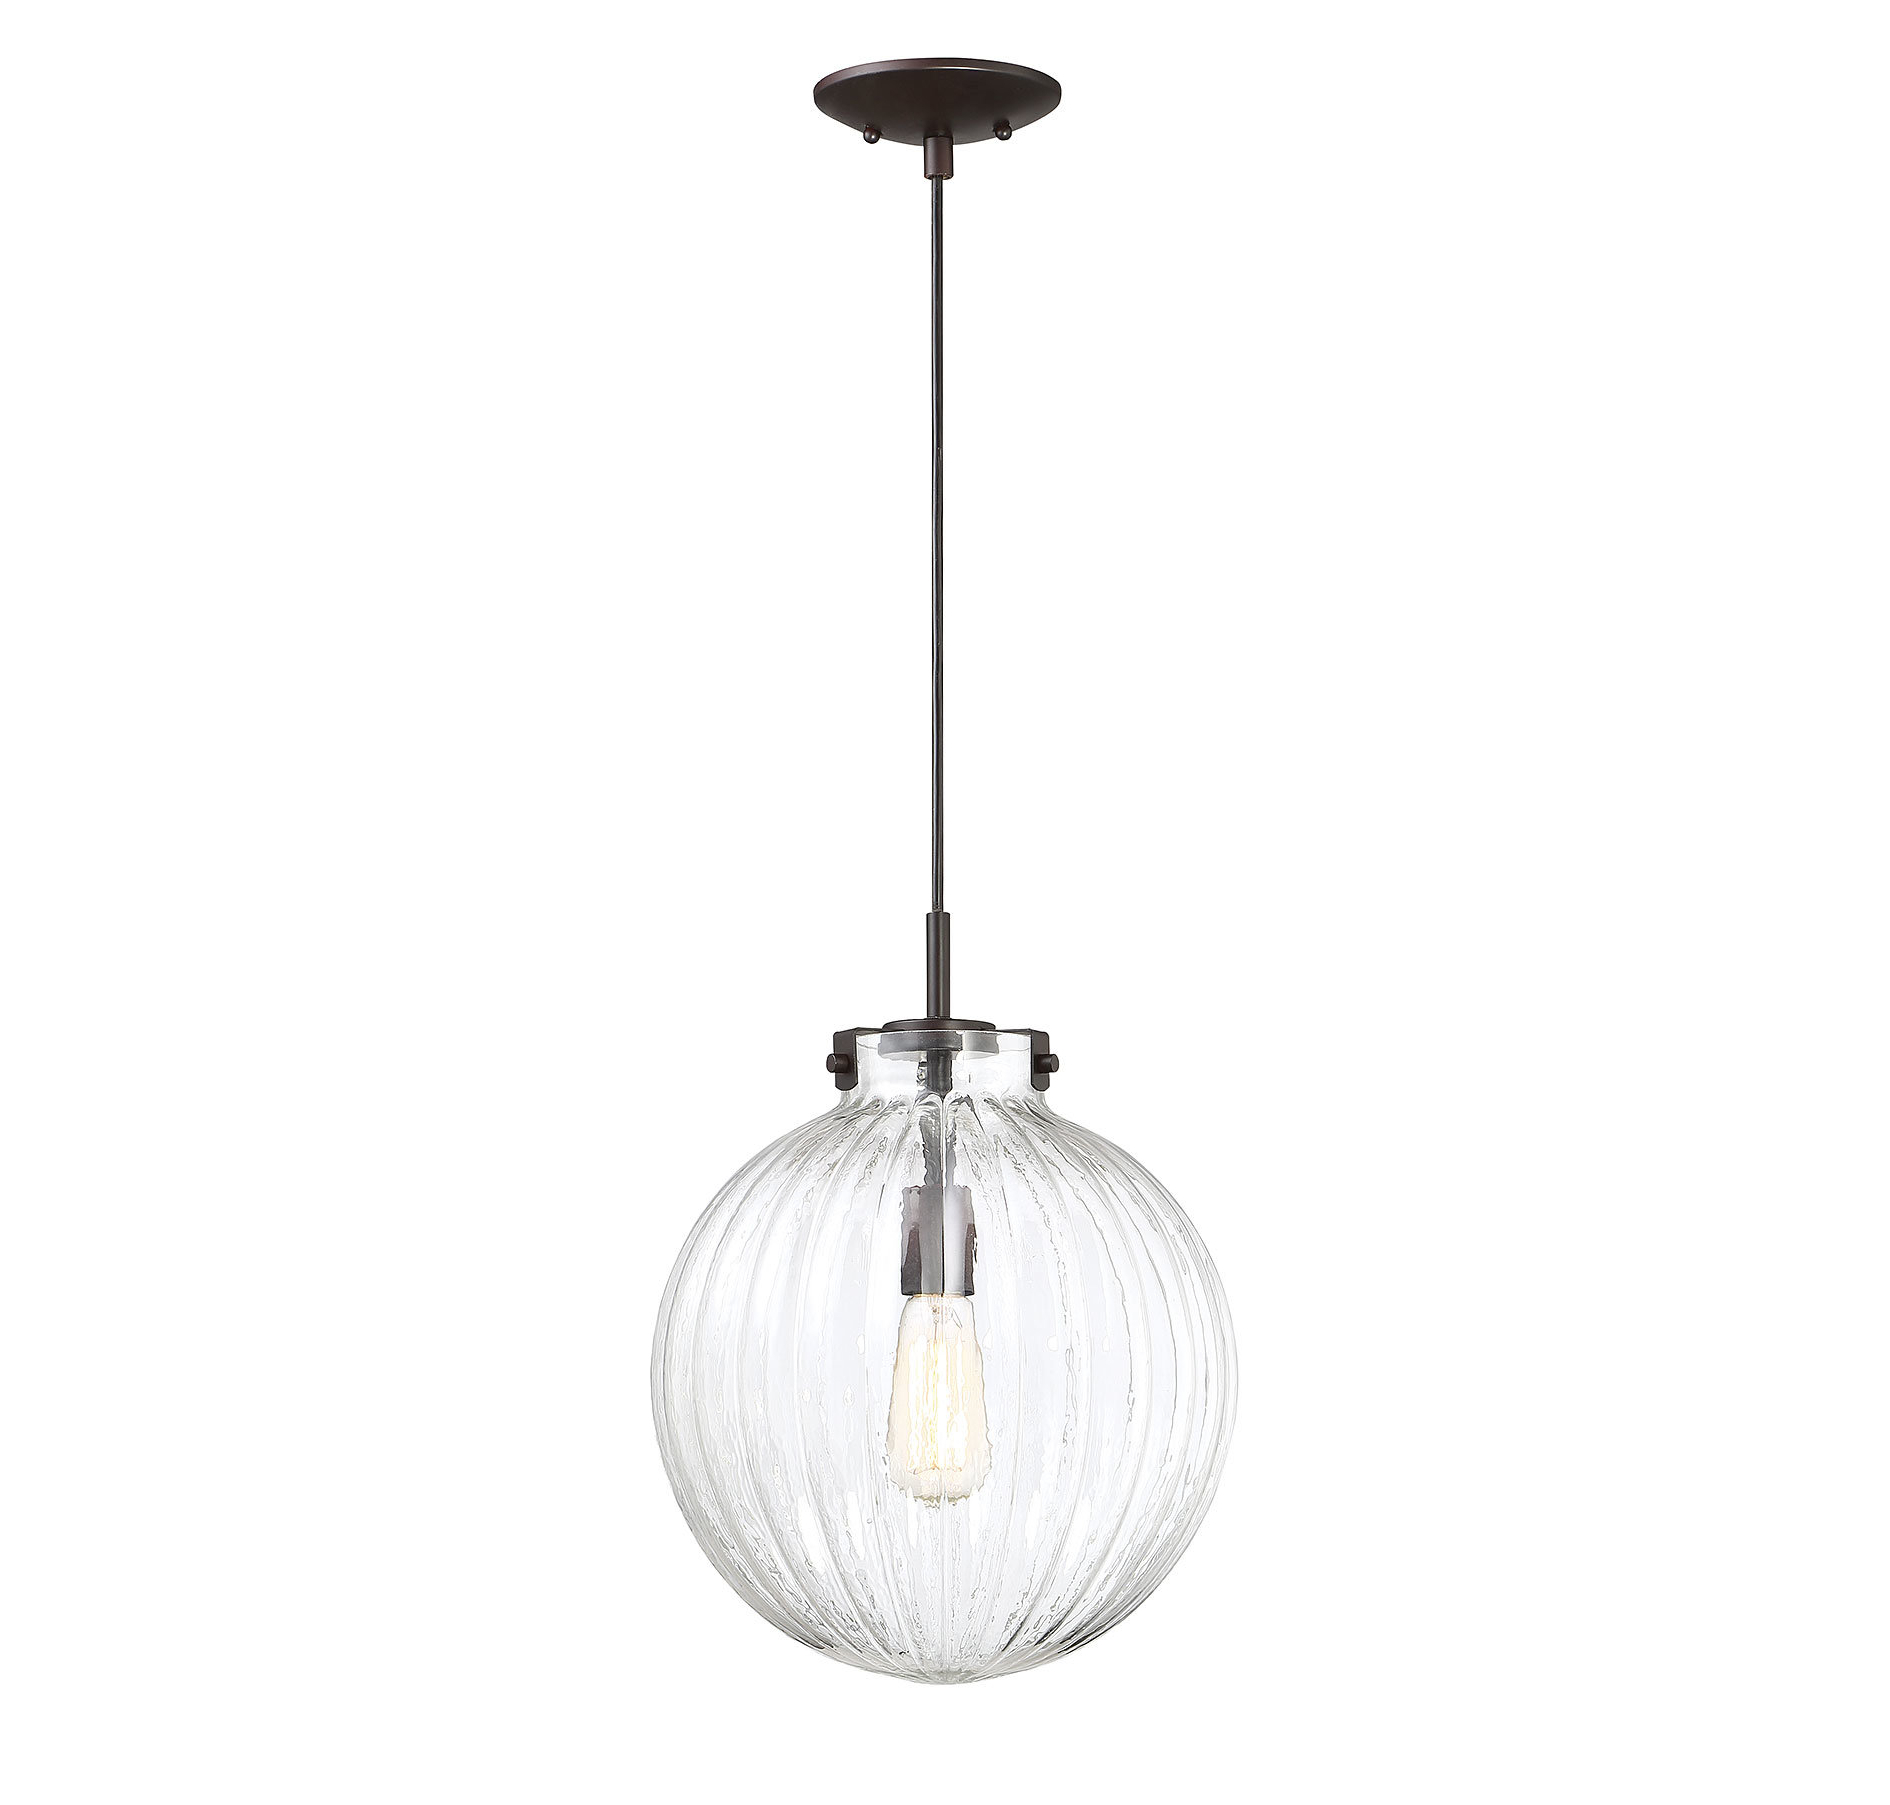 Latest Betsy 1 Light Single Globe Pendants Intended For Nevels 1 Light Single Globe Pendant (View 7 of 20)